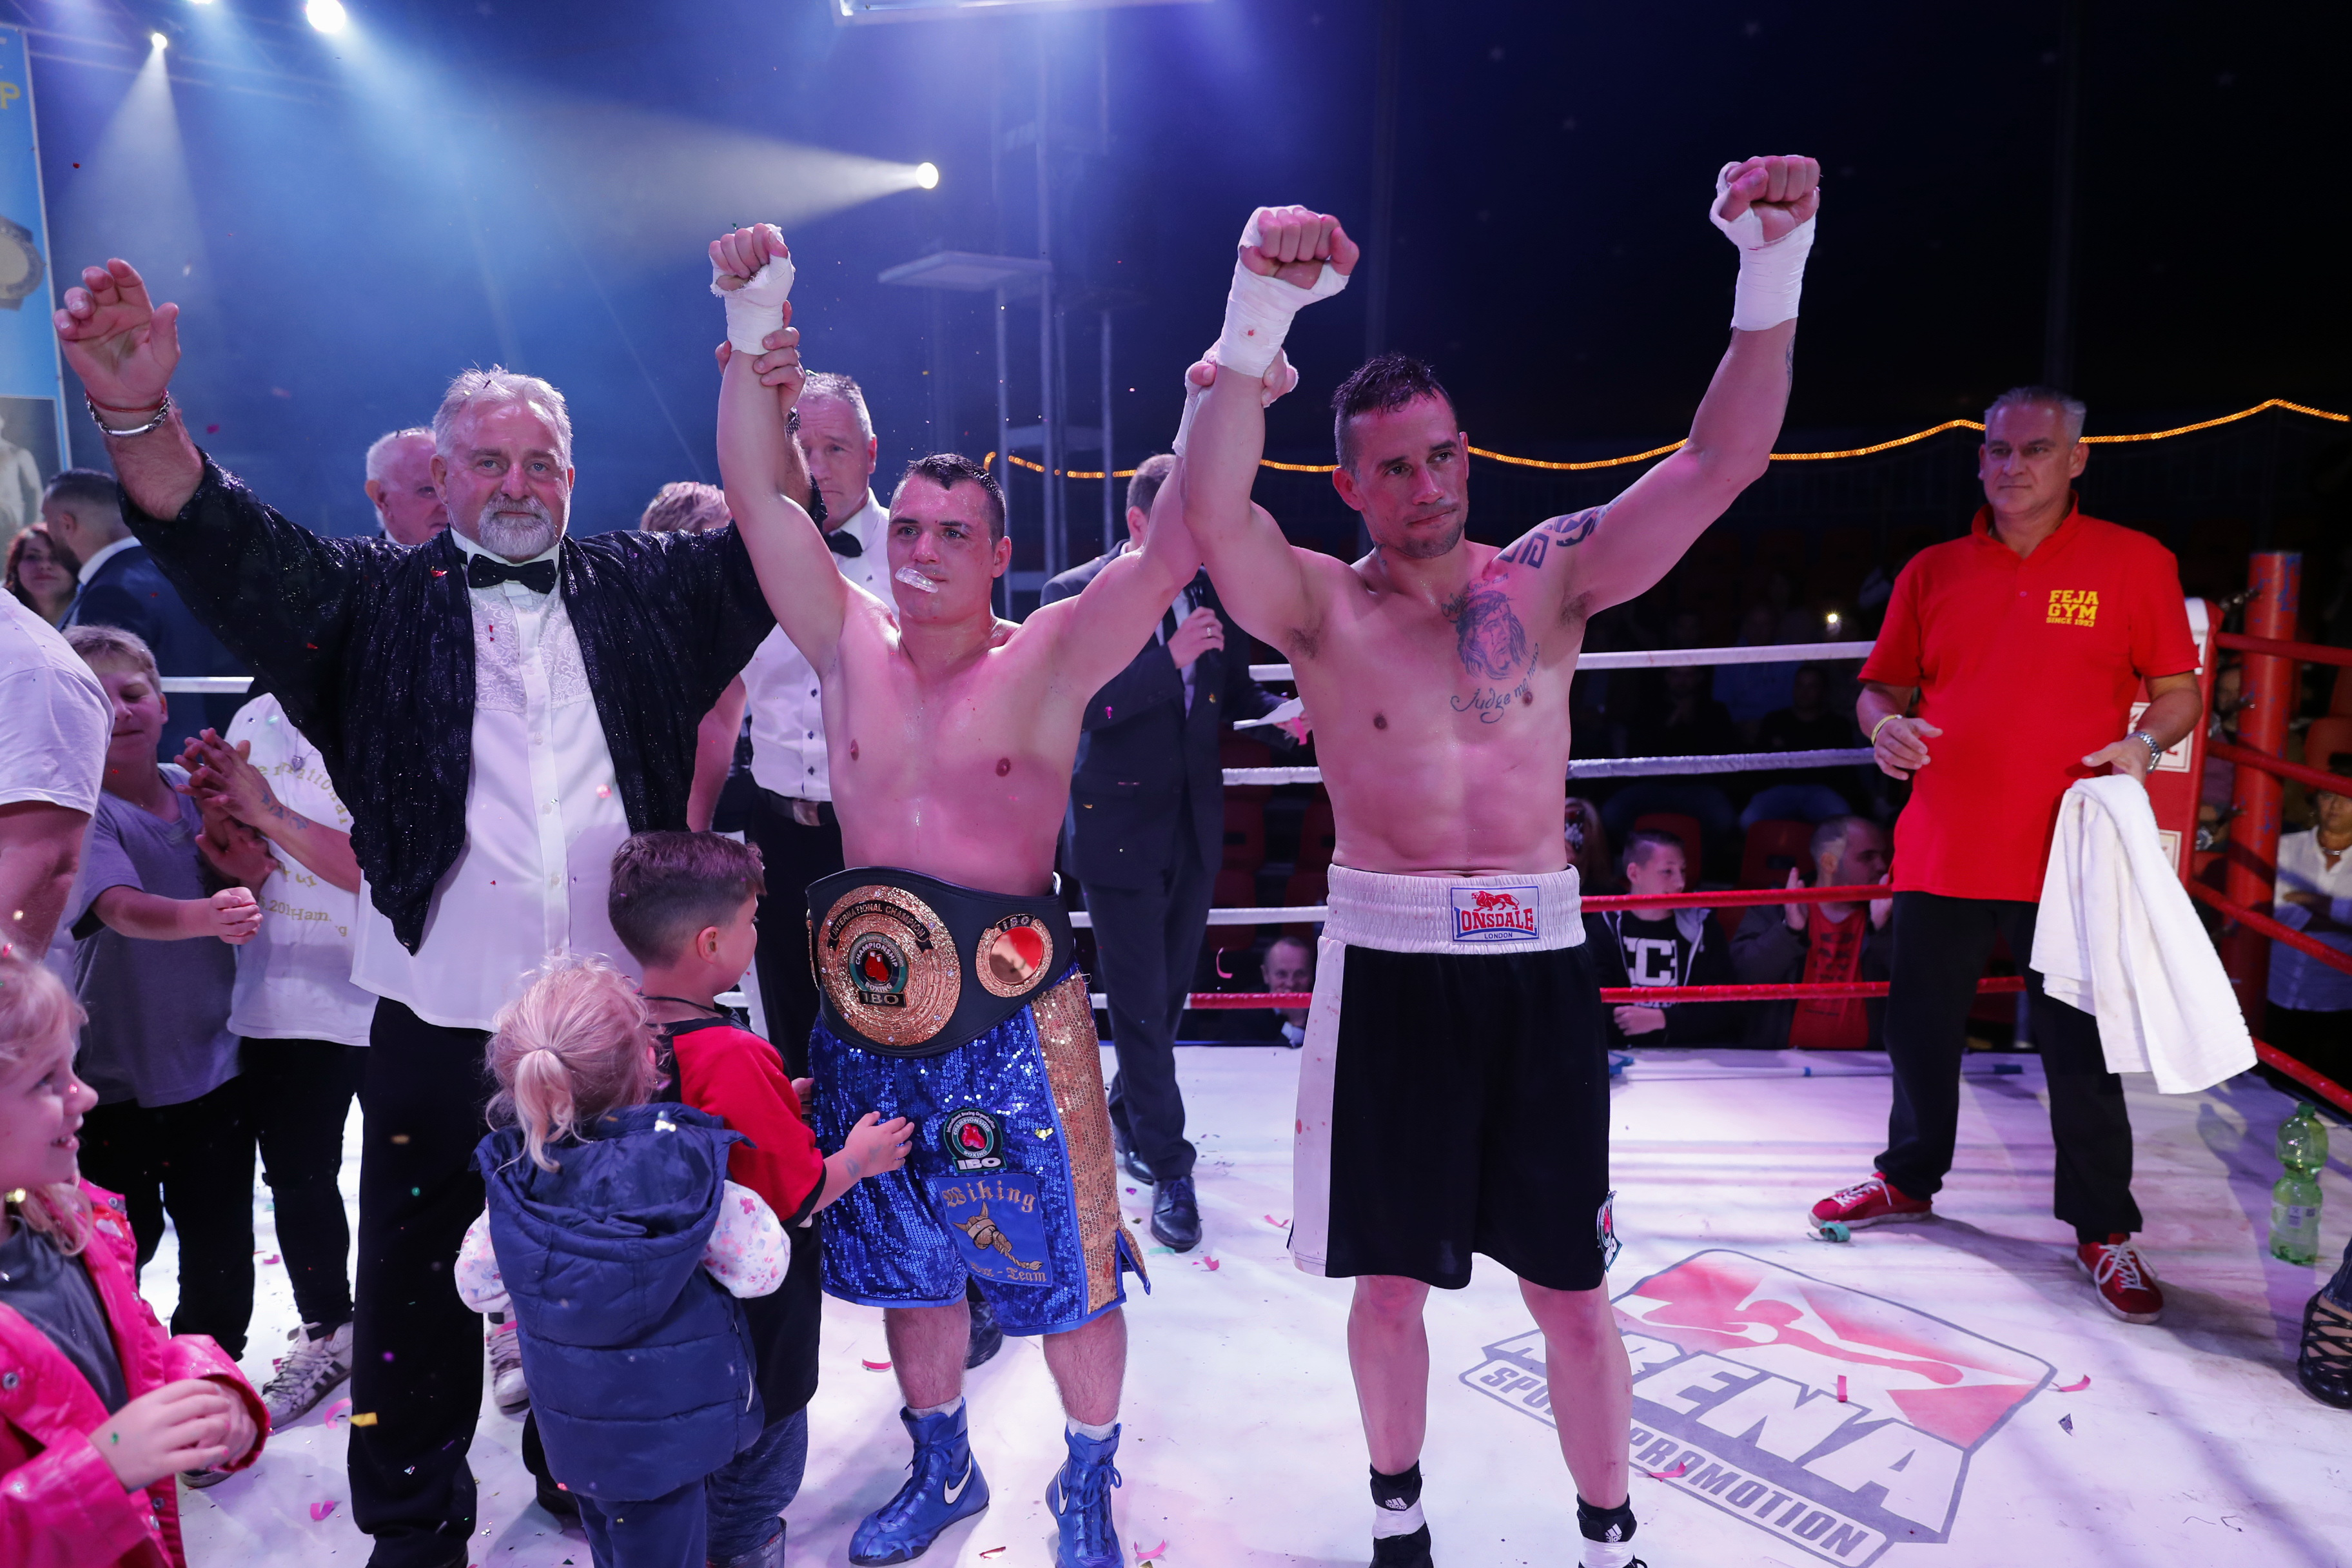 Neuer IBO international Champion Angelo Frank